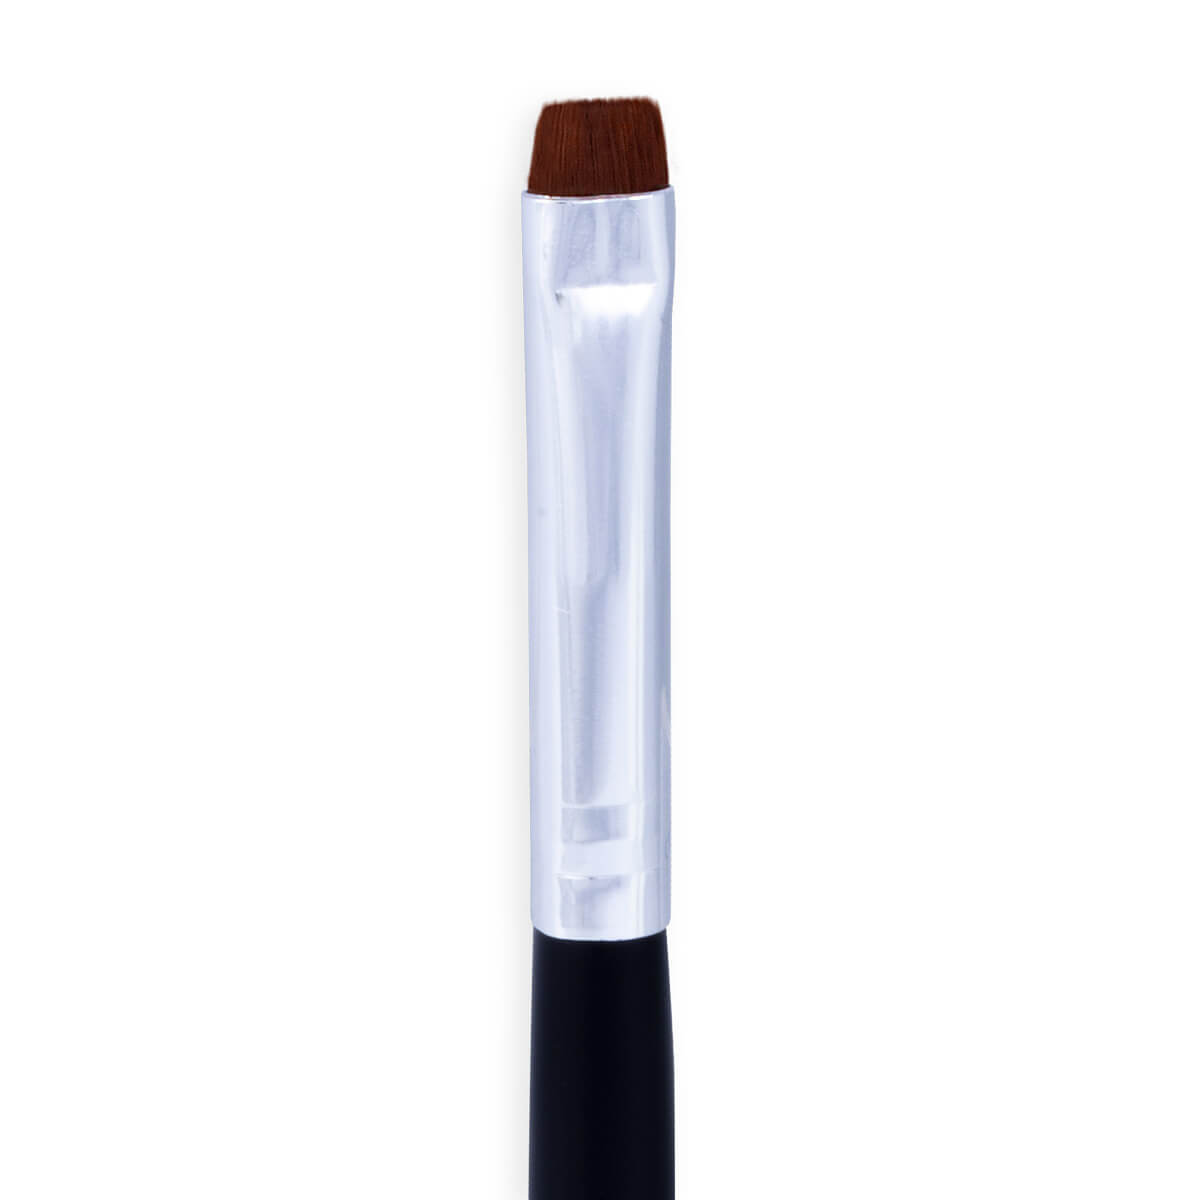 S153 - Pincel Para Delinear Profissional Sffumato Beauty